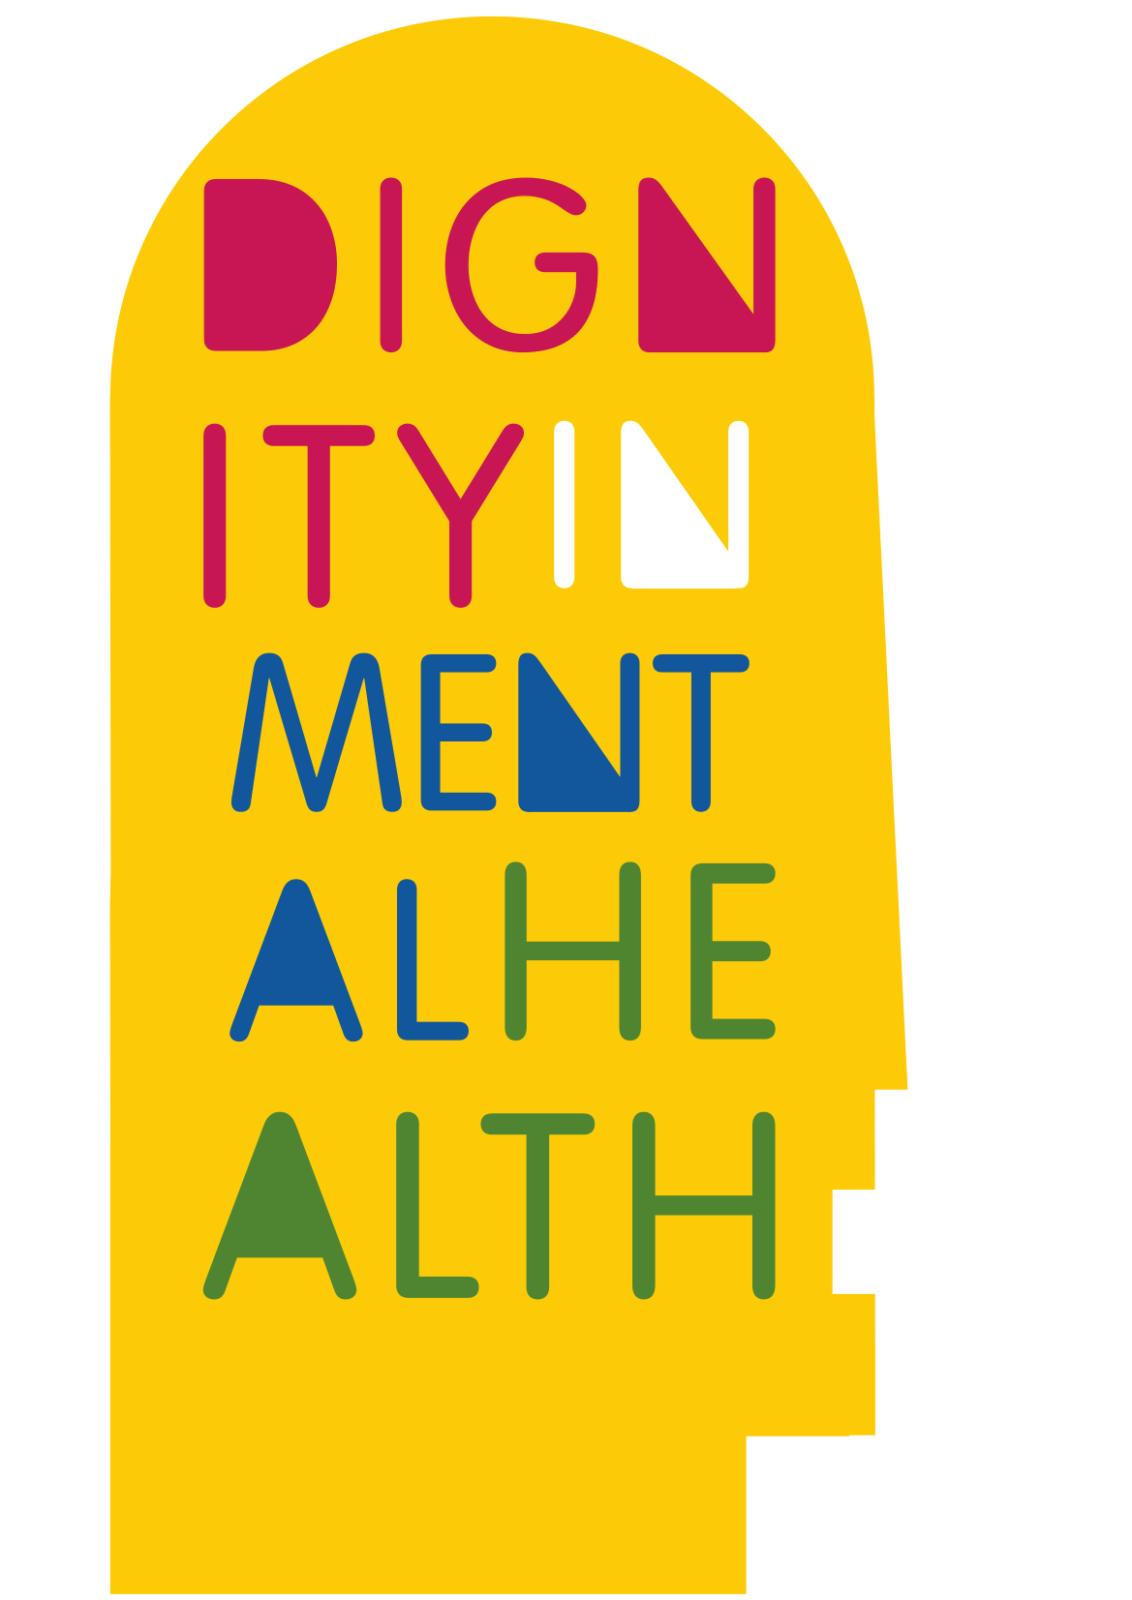 DIMN Logo